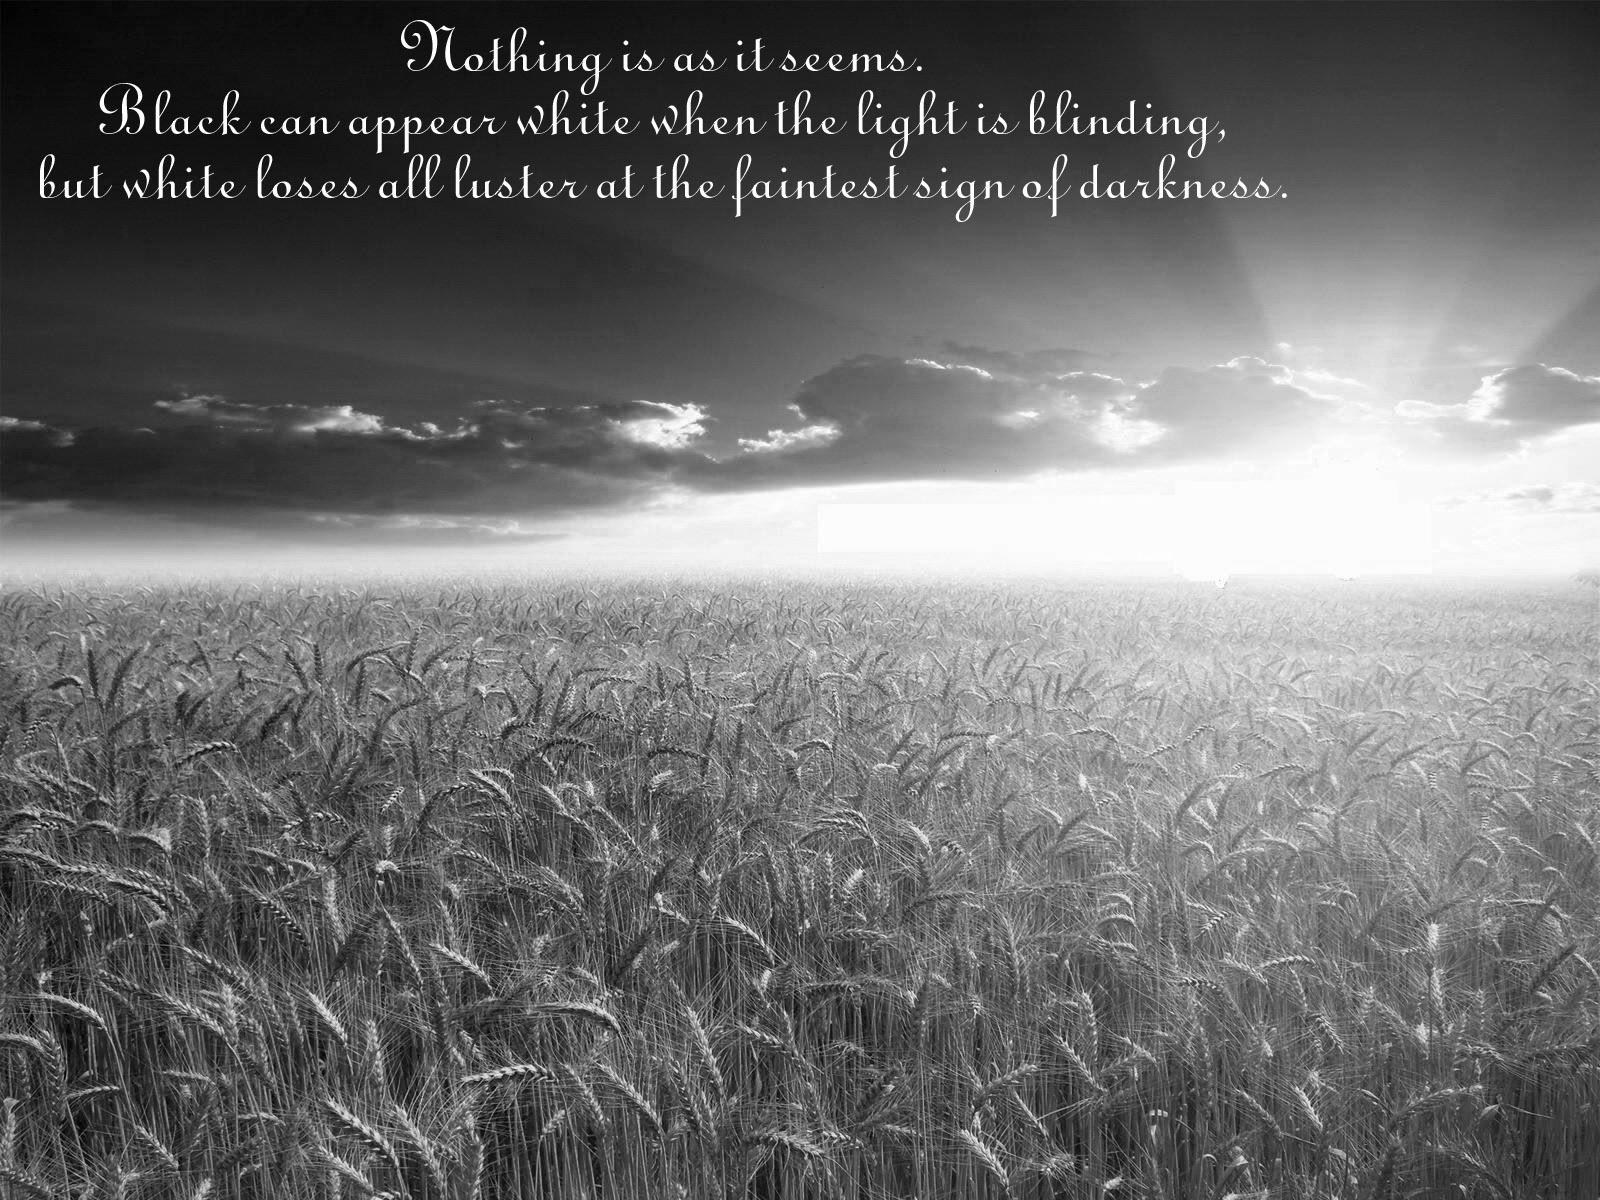 Wallpaper quote #1